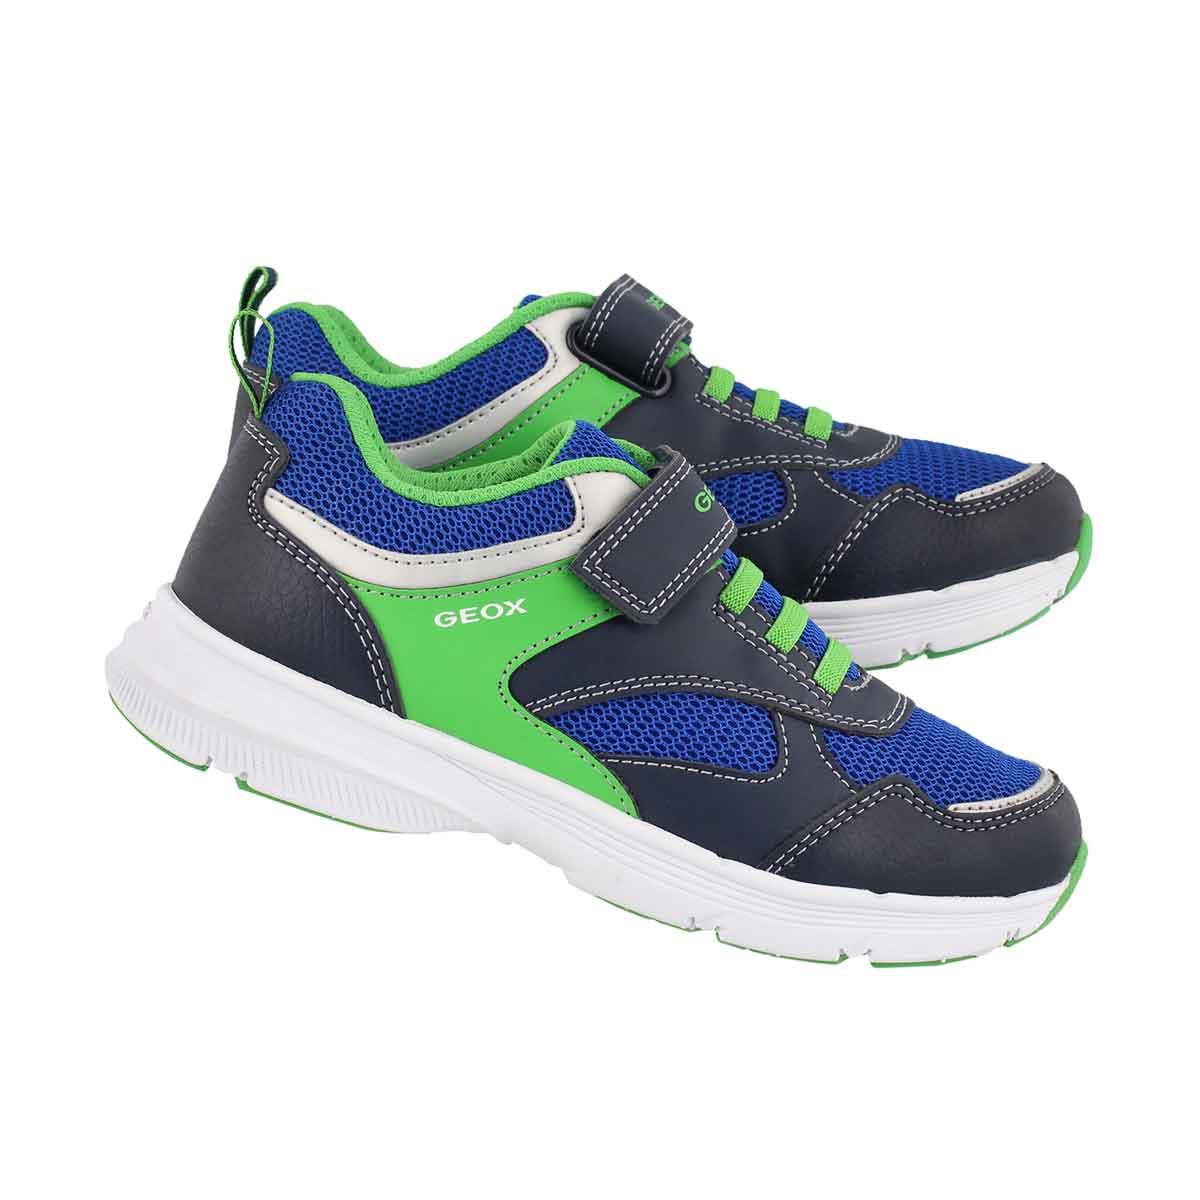 Bys J Hoshiko ryl/grn sneaker